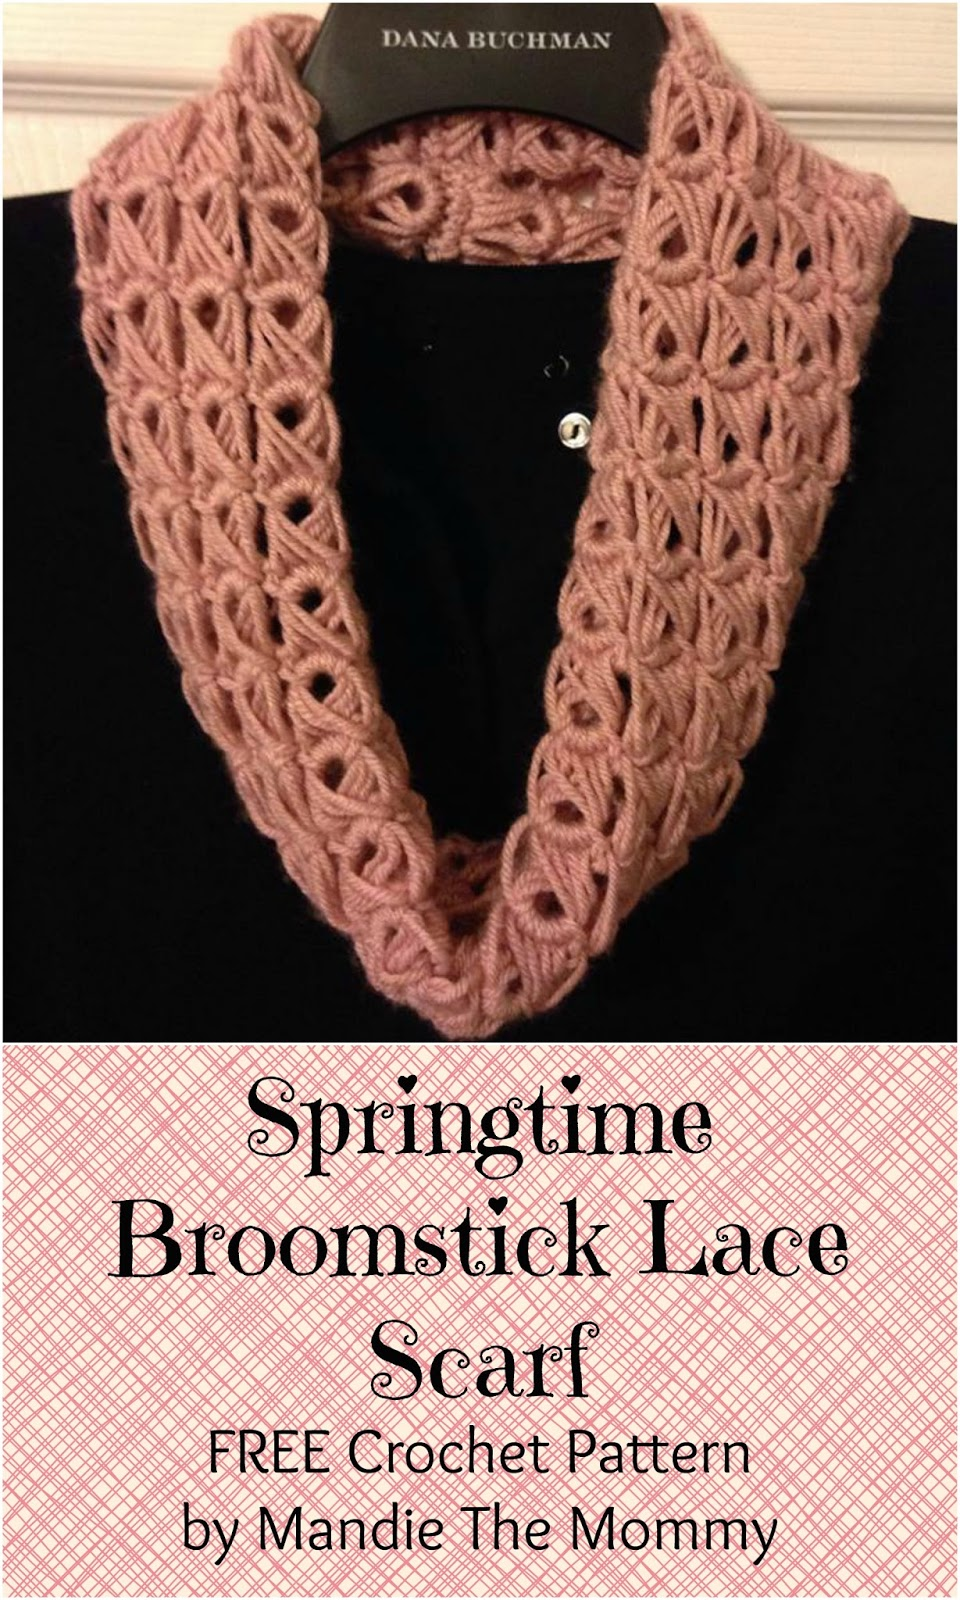 Springtime Broomstick Lace Scarf - Free Pattern